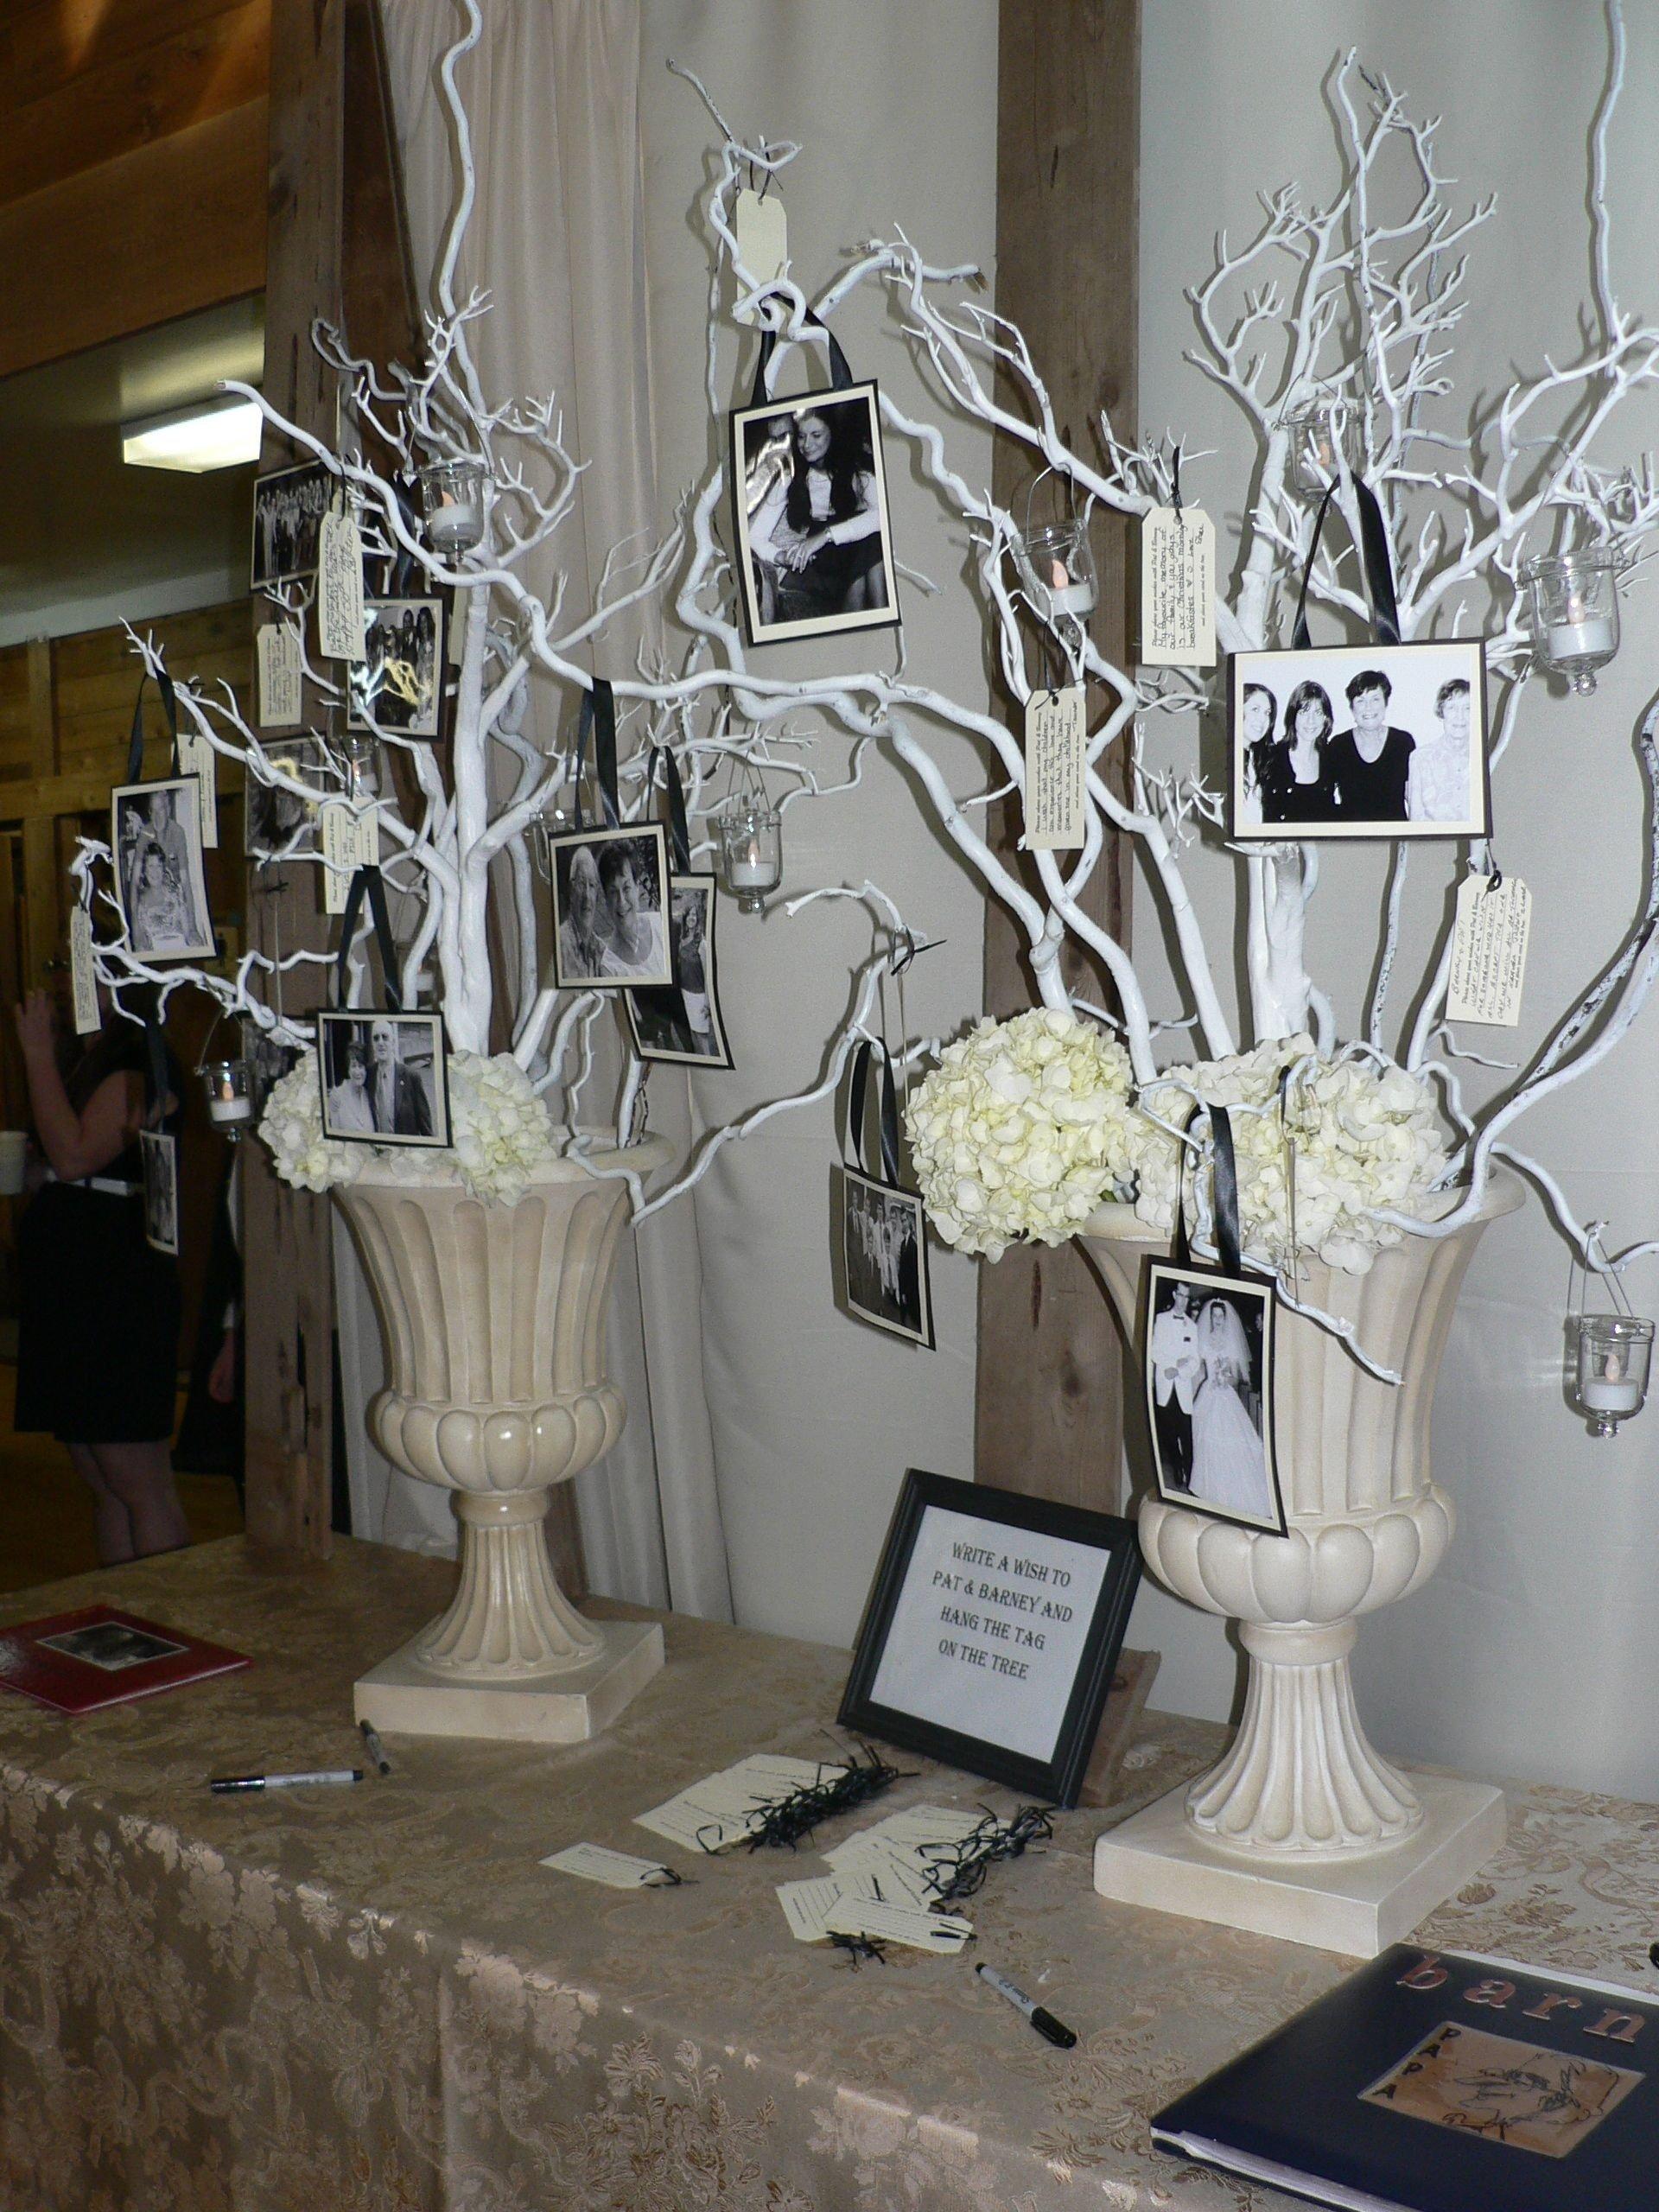 10 Wonderful 25 Wedding Anniversary Party Ideas 50th anniversary party ideas on a budget 50th anniversary at 1 2020